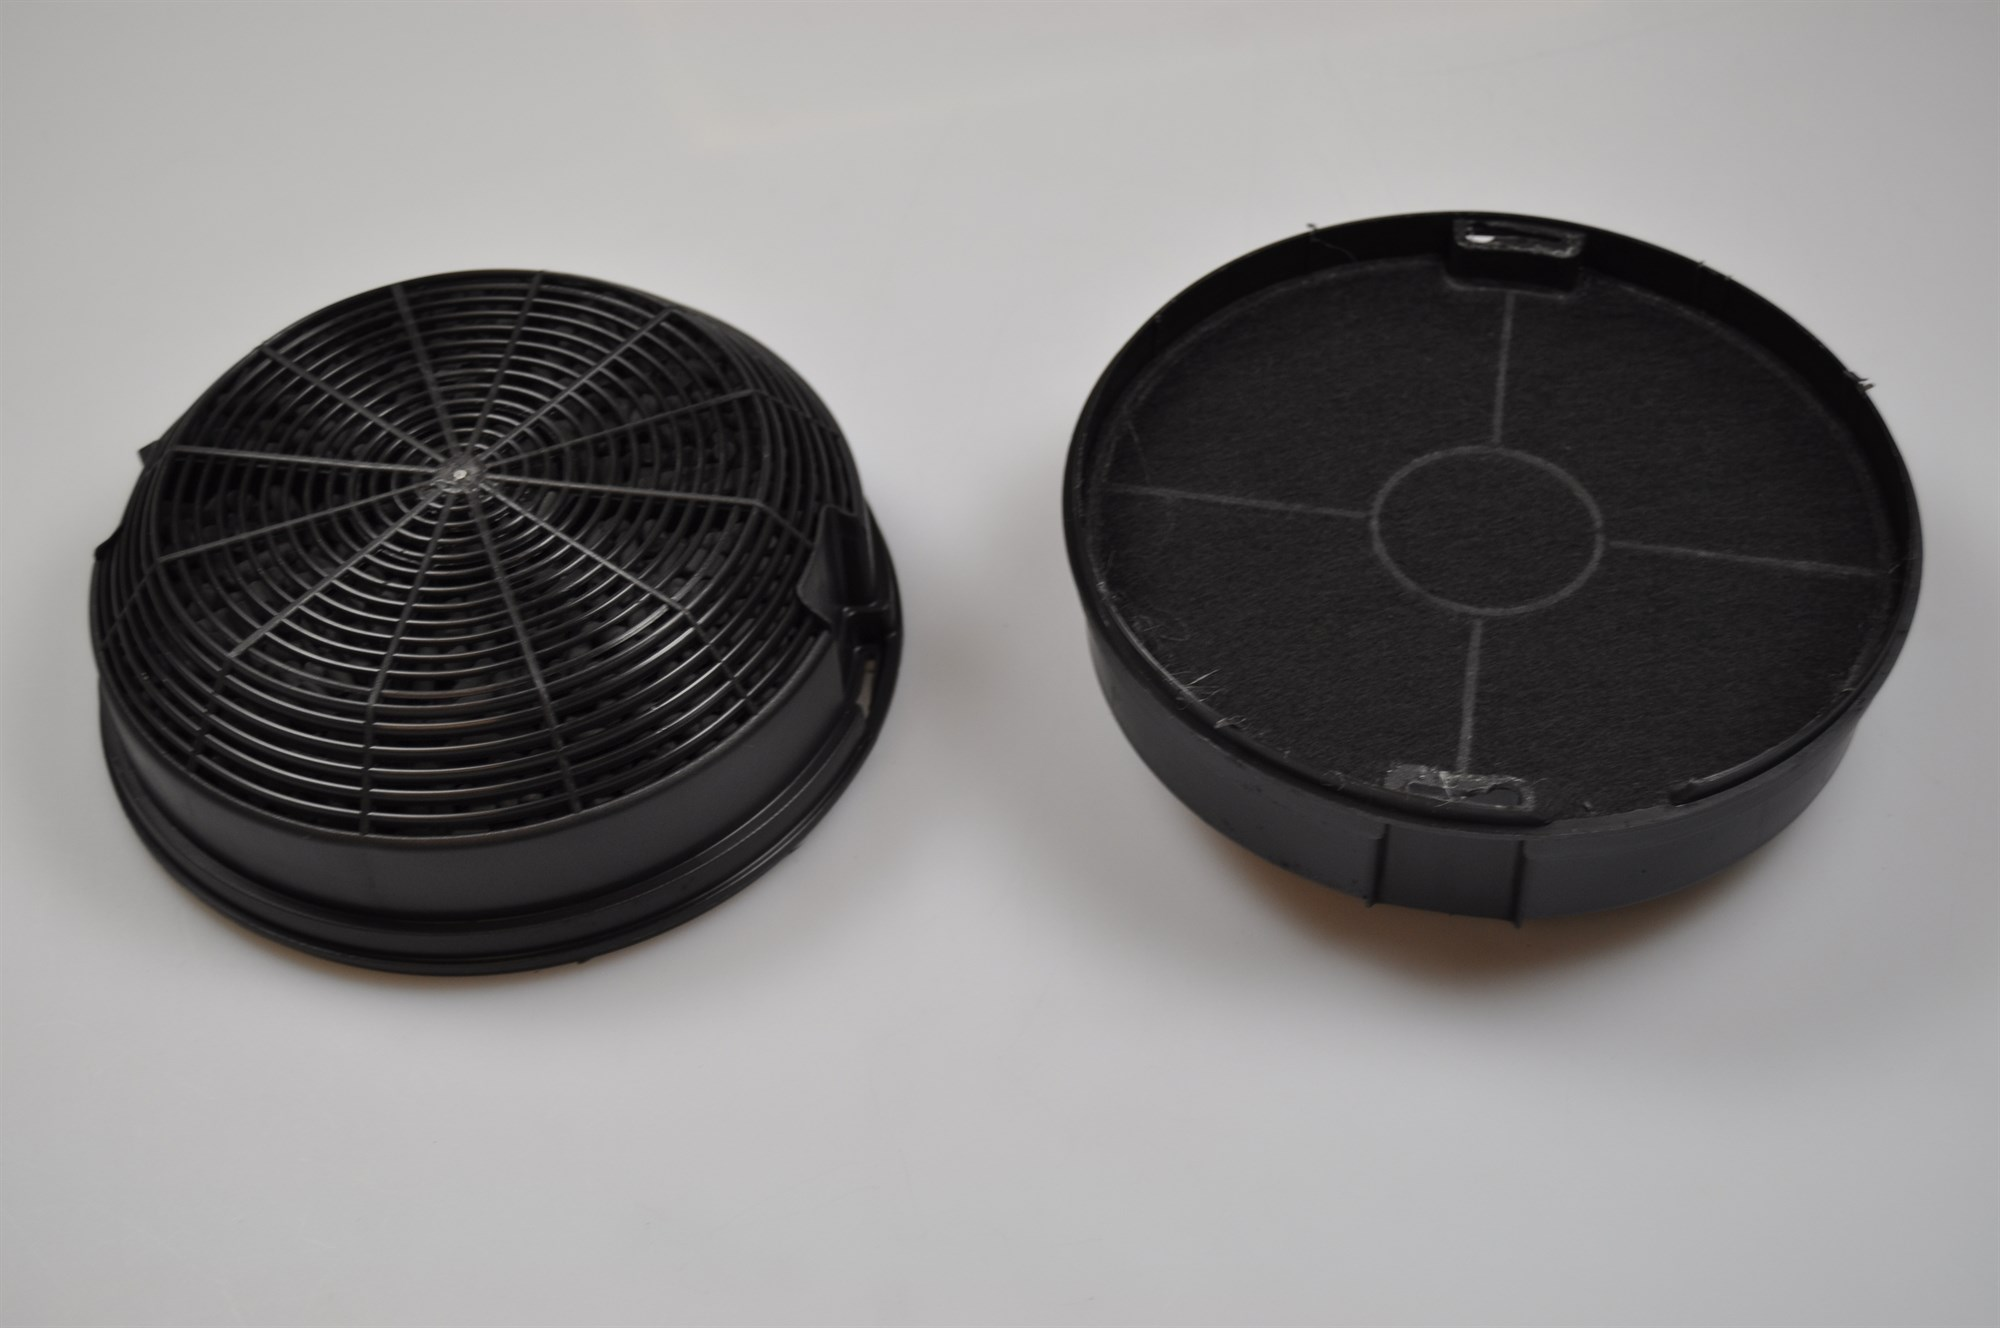 Kohlefilter juno electrolux dunstabzugshaube mm stck